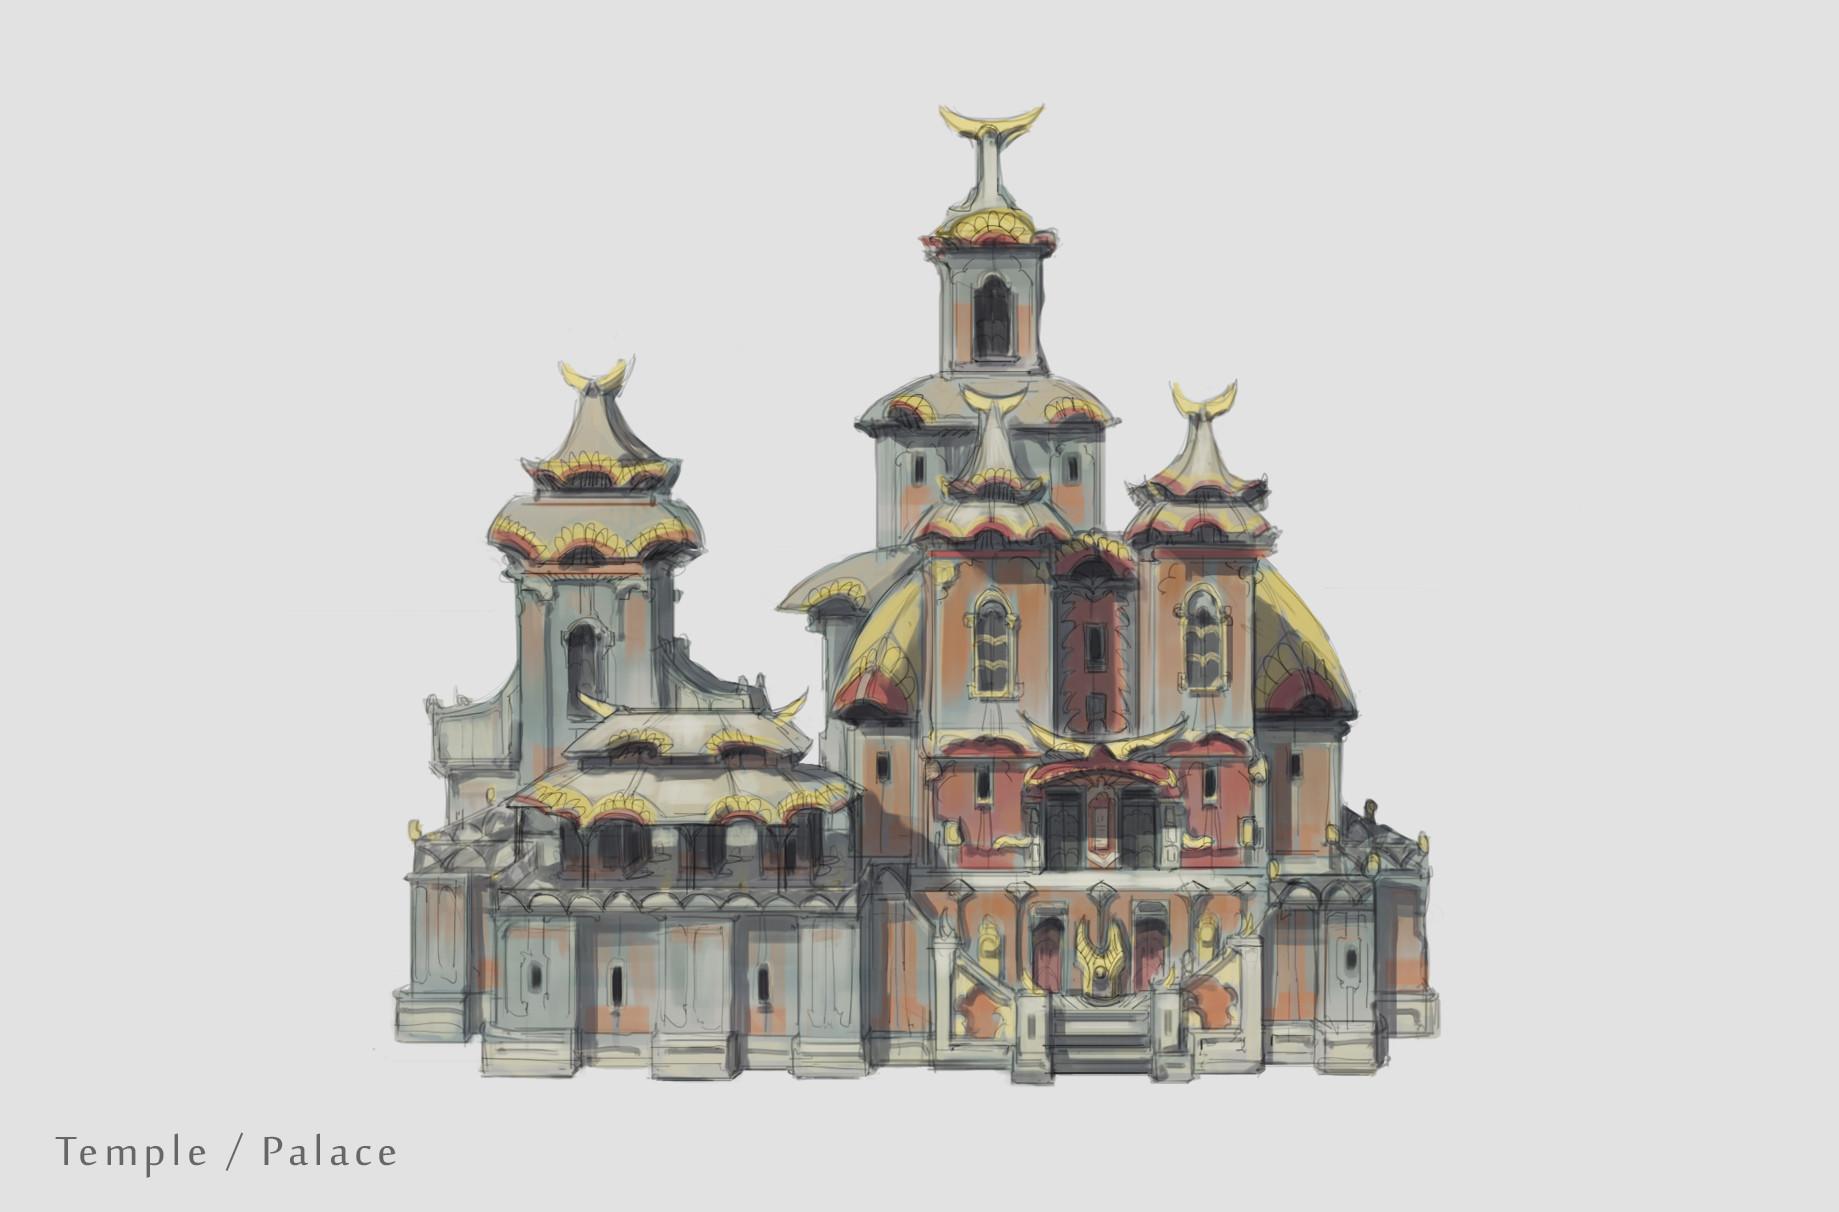 Nathan elmer architecture v002